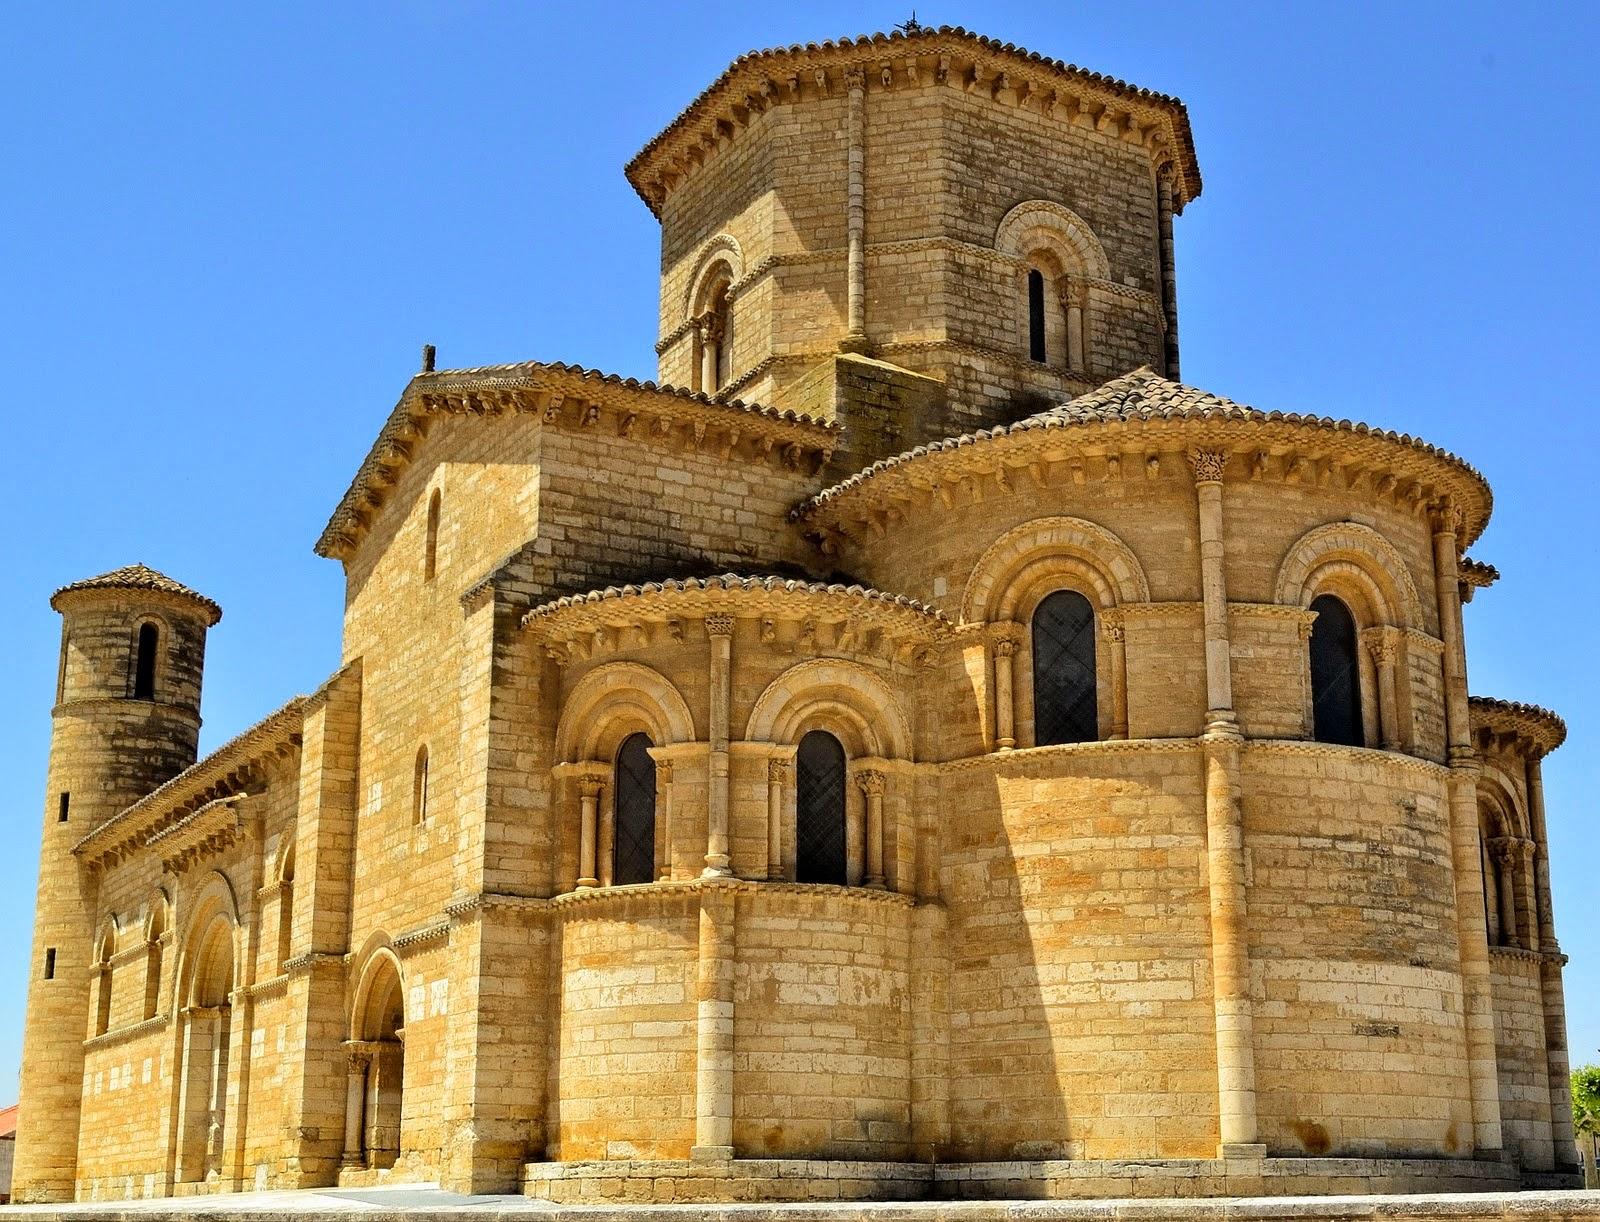 Historia de la arquitectrura ii rom nico for Arte arquitectura y diseno definicion